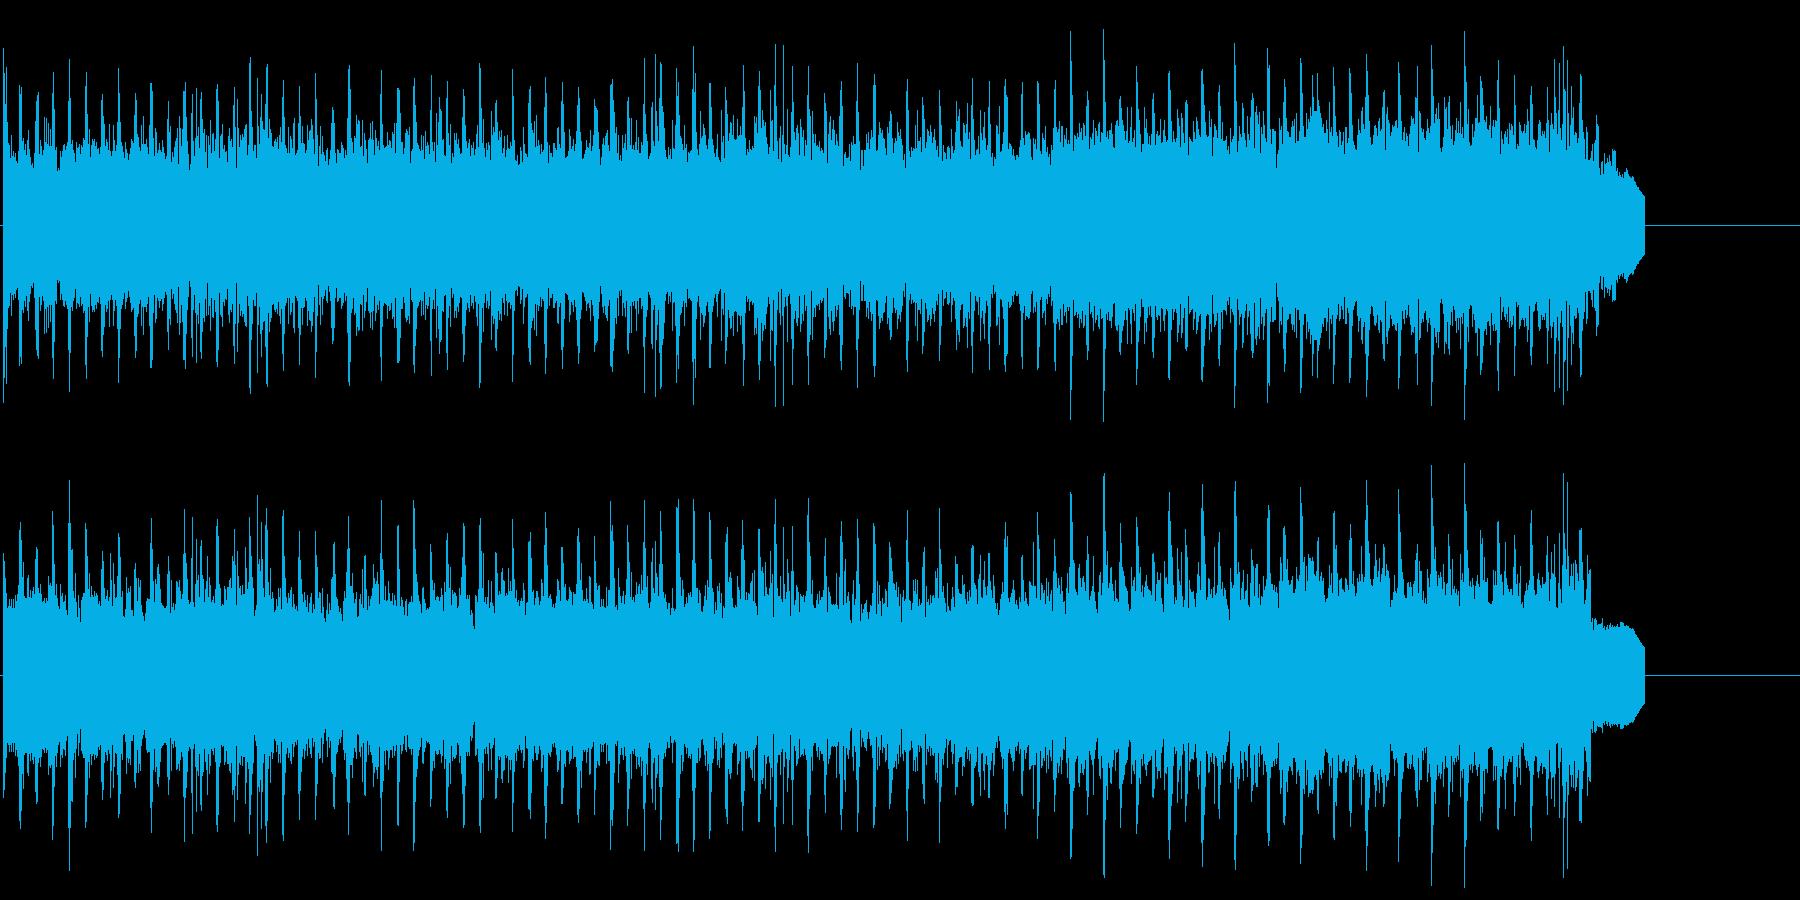 CM 明るい わくわく 楽しい の再生済みの波形